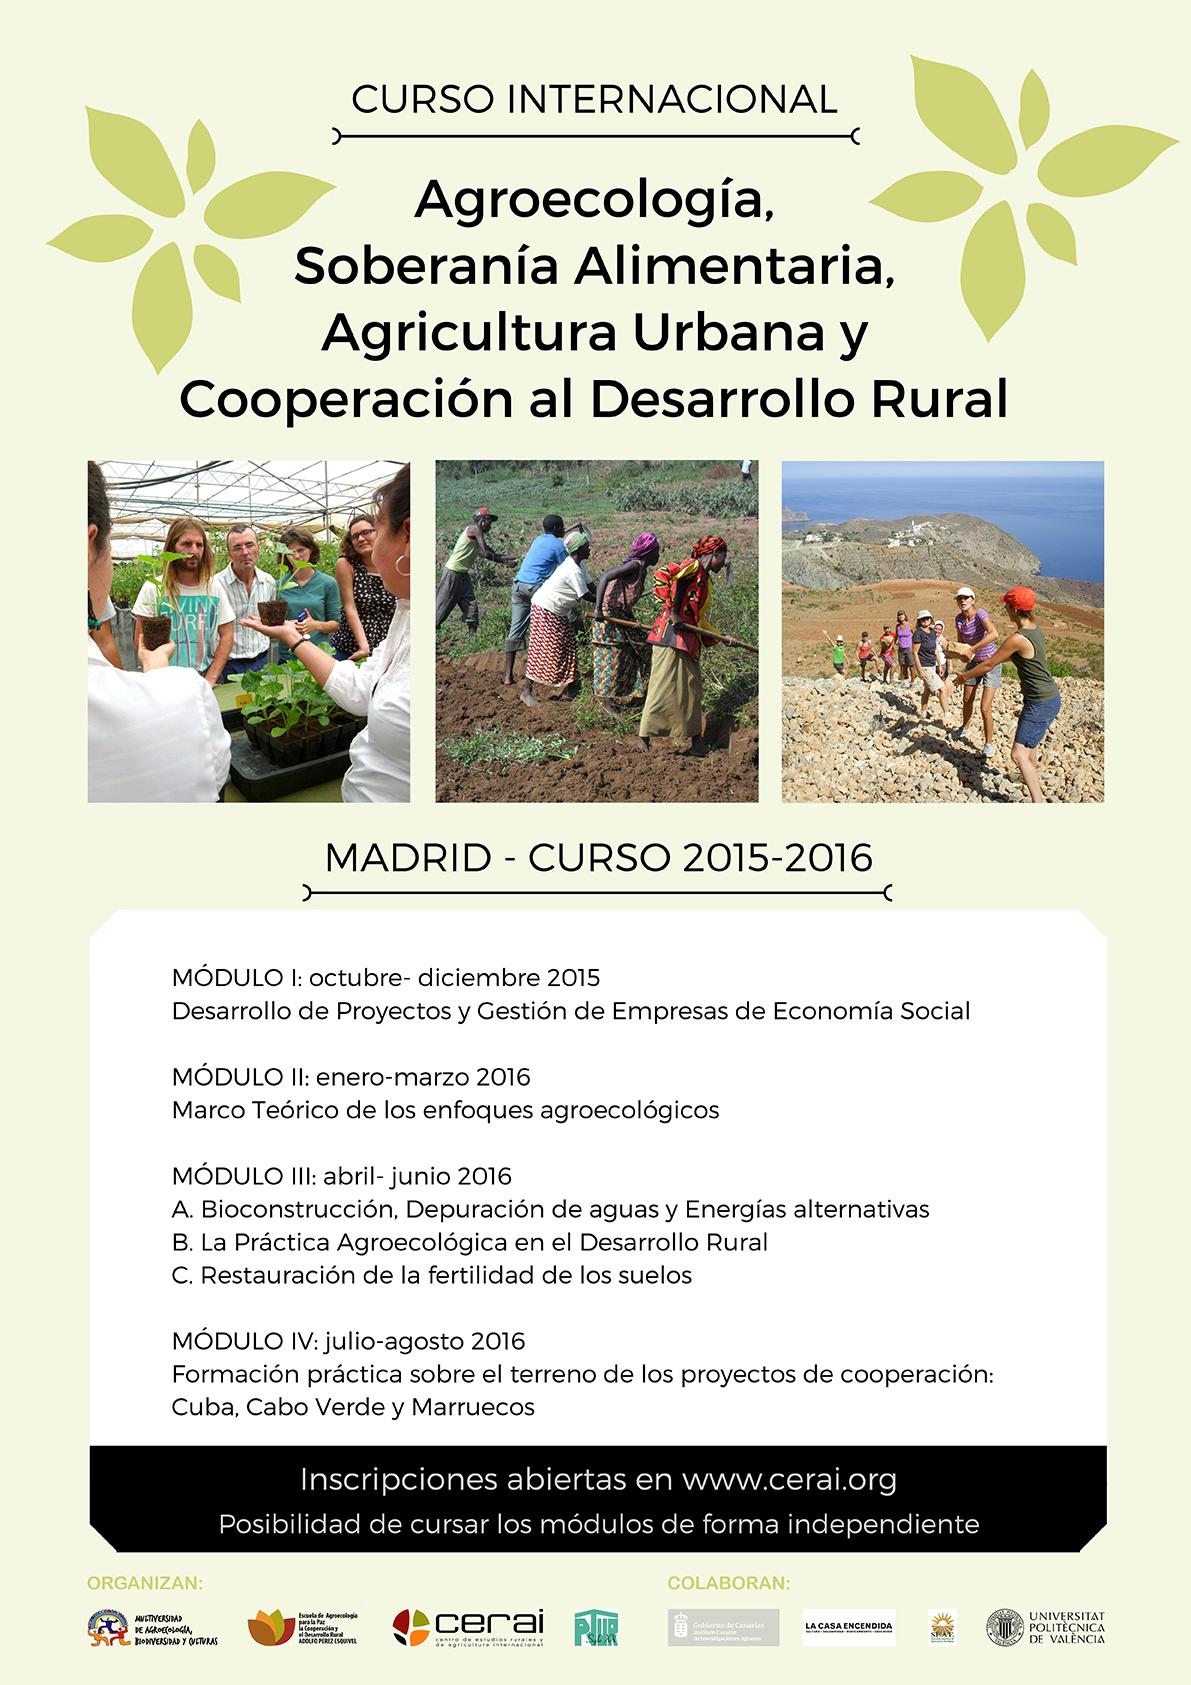 curso madrid 2015-2016